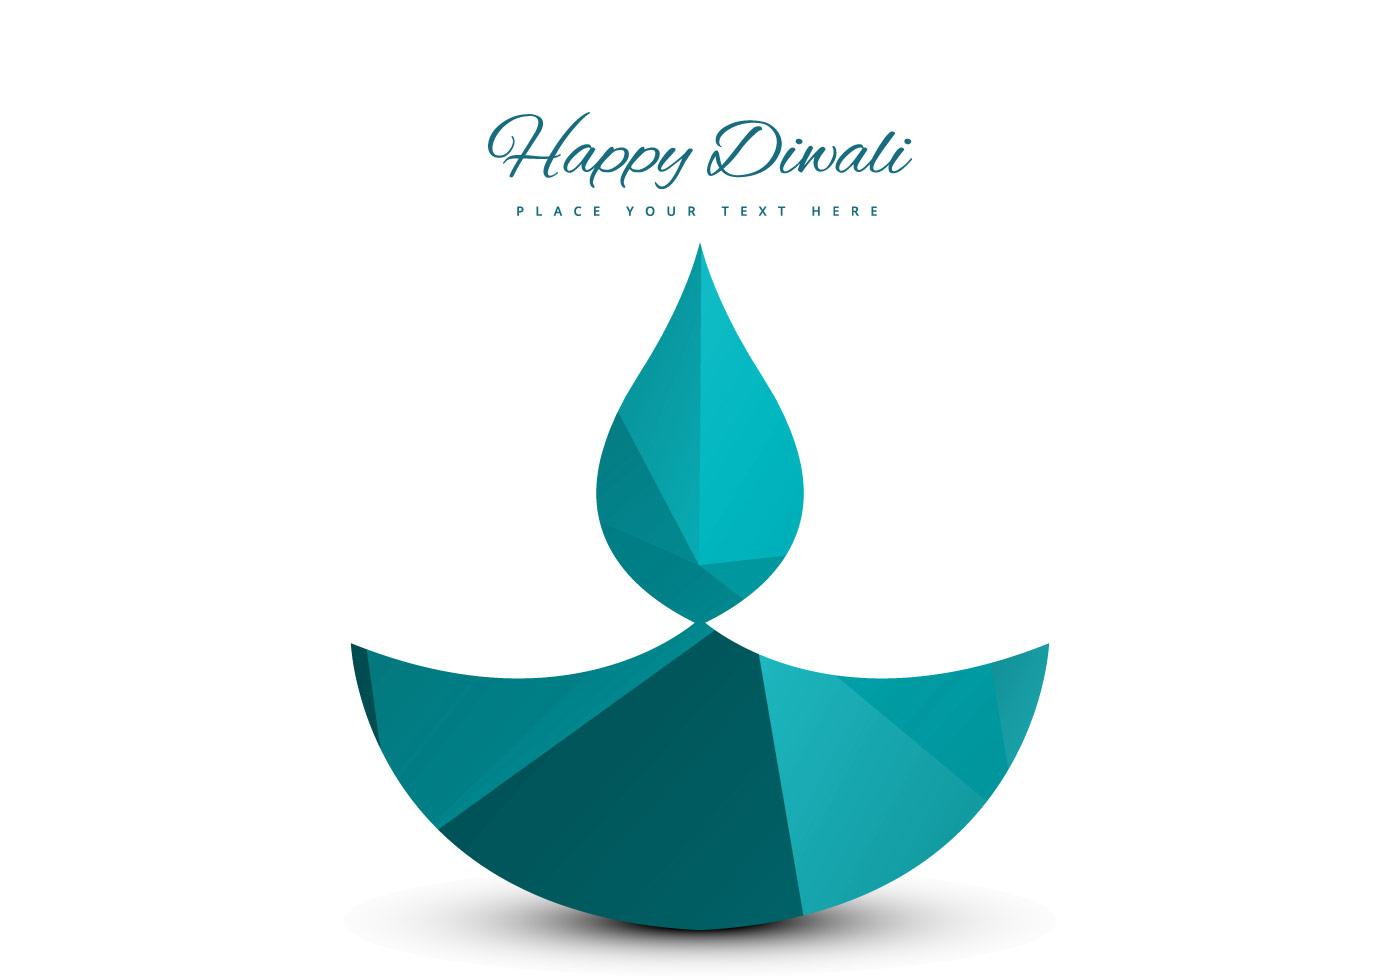 Vector Diya Design On Happy Diwali Card - Download Free ...  Vector Diya Des...